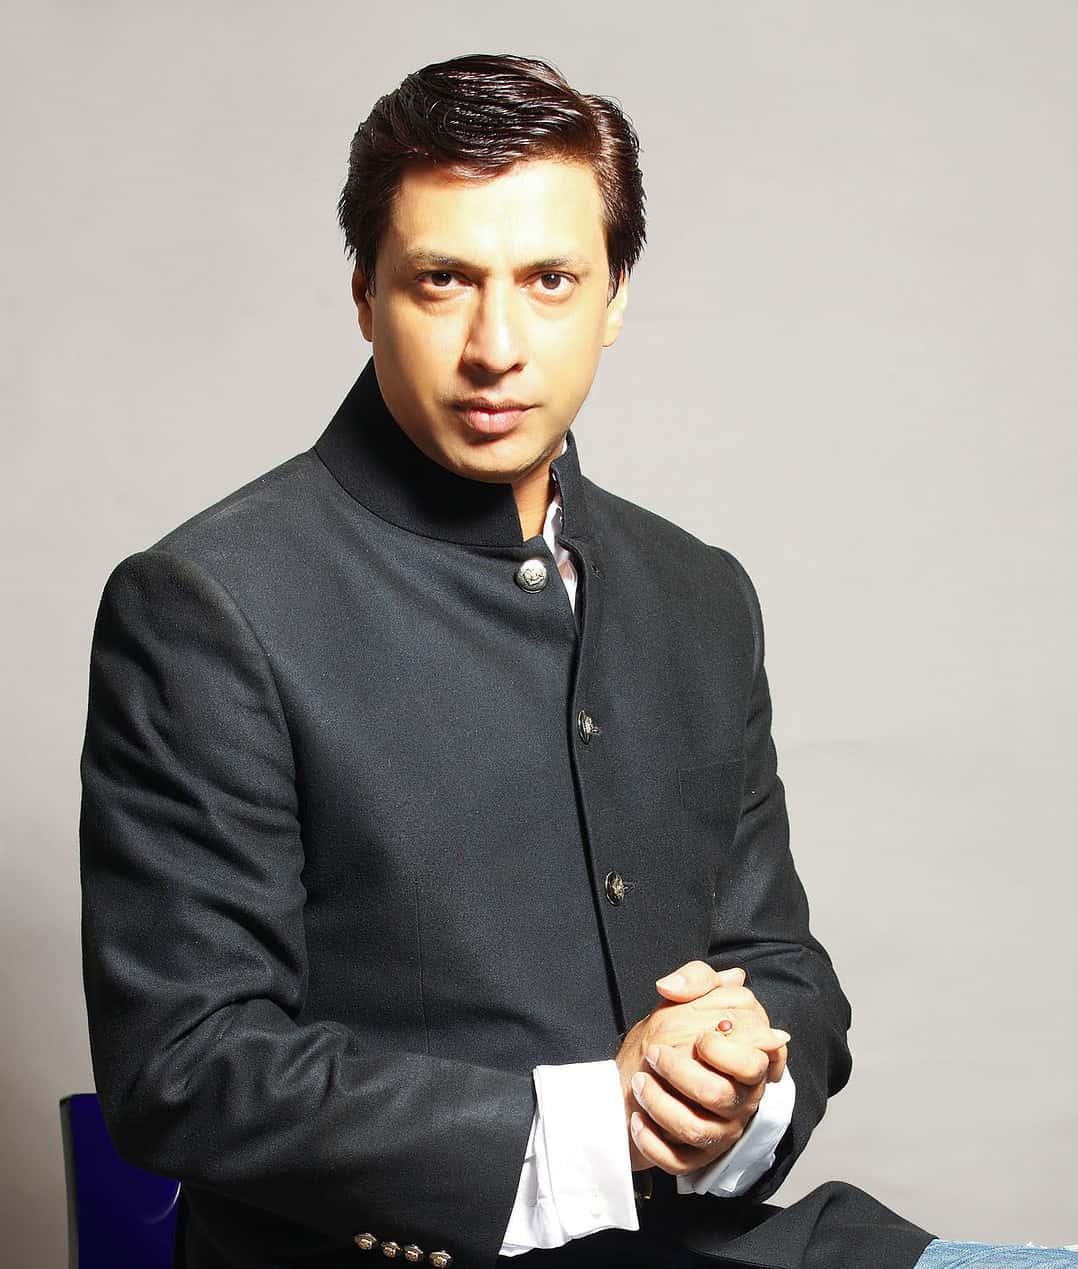 madhur-bhandarkar-height-weight-age-affairs-body-stats-bollywoodfox-2